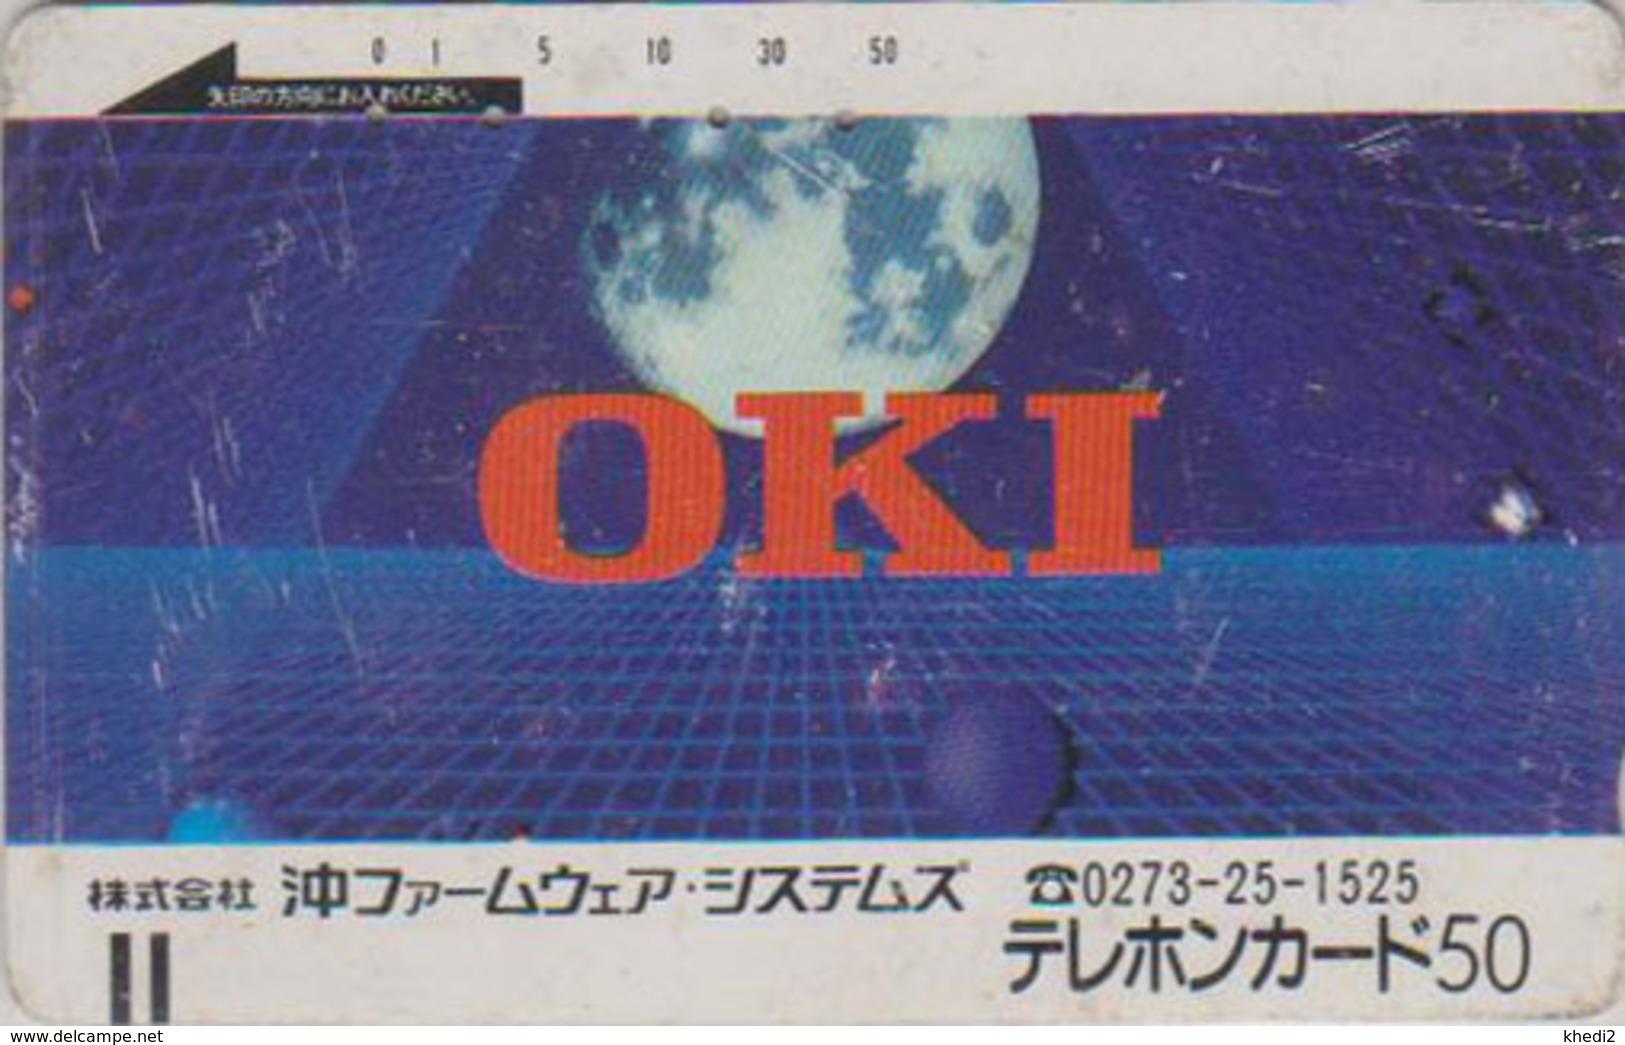 Télécarte Ancienne Japon UNDER 1000 / 110-373 - Globe Pub OKI - Japan Front Bar Phonecard / A2 - Balken TK - Japan